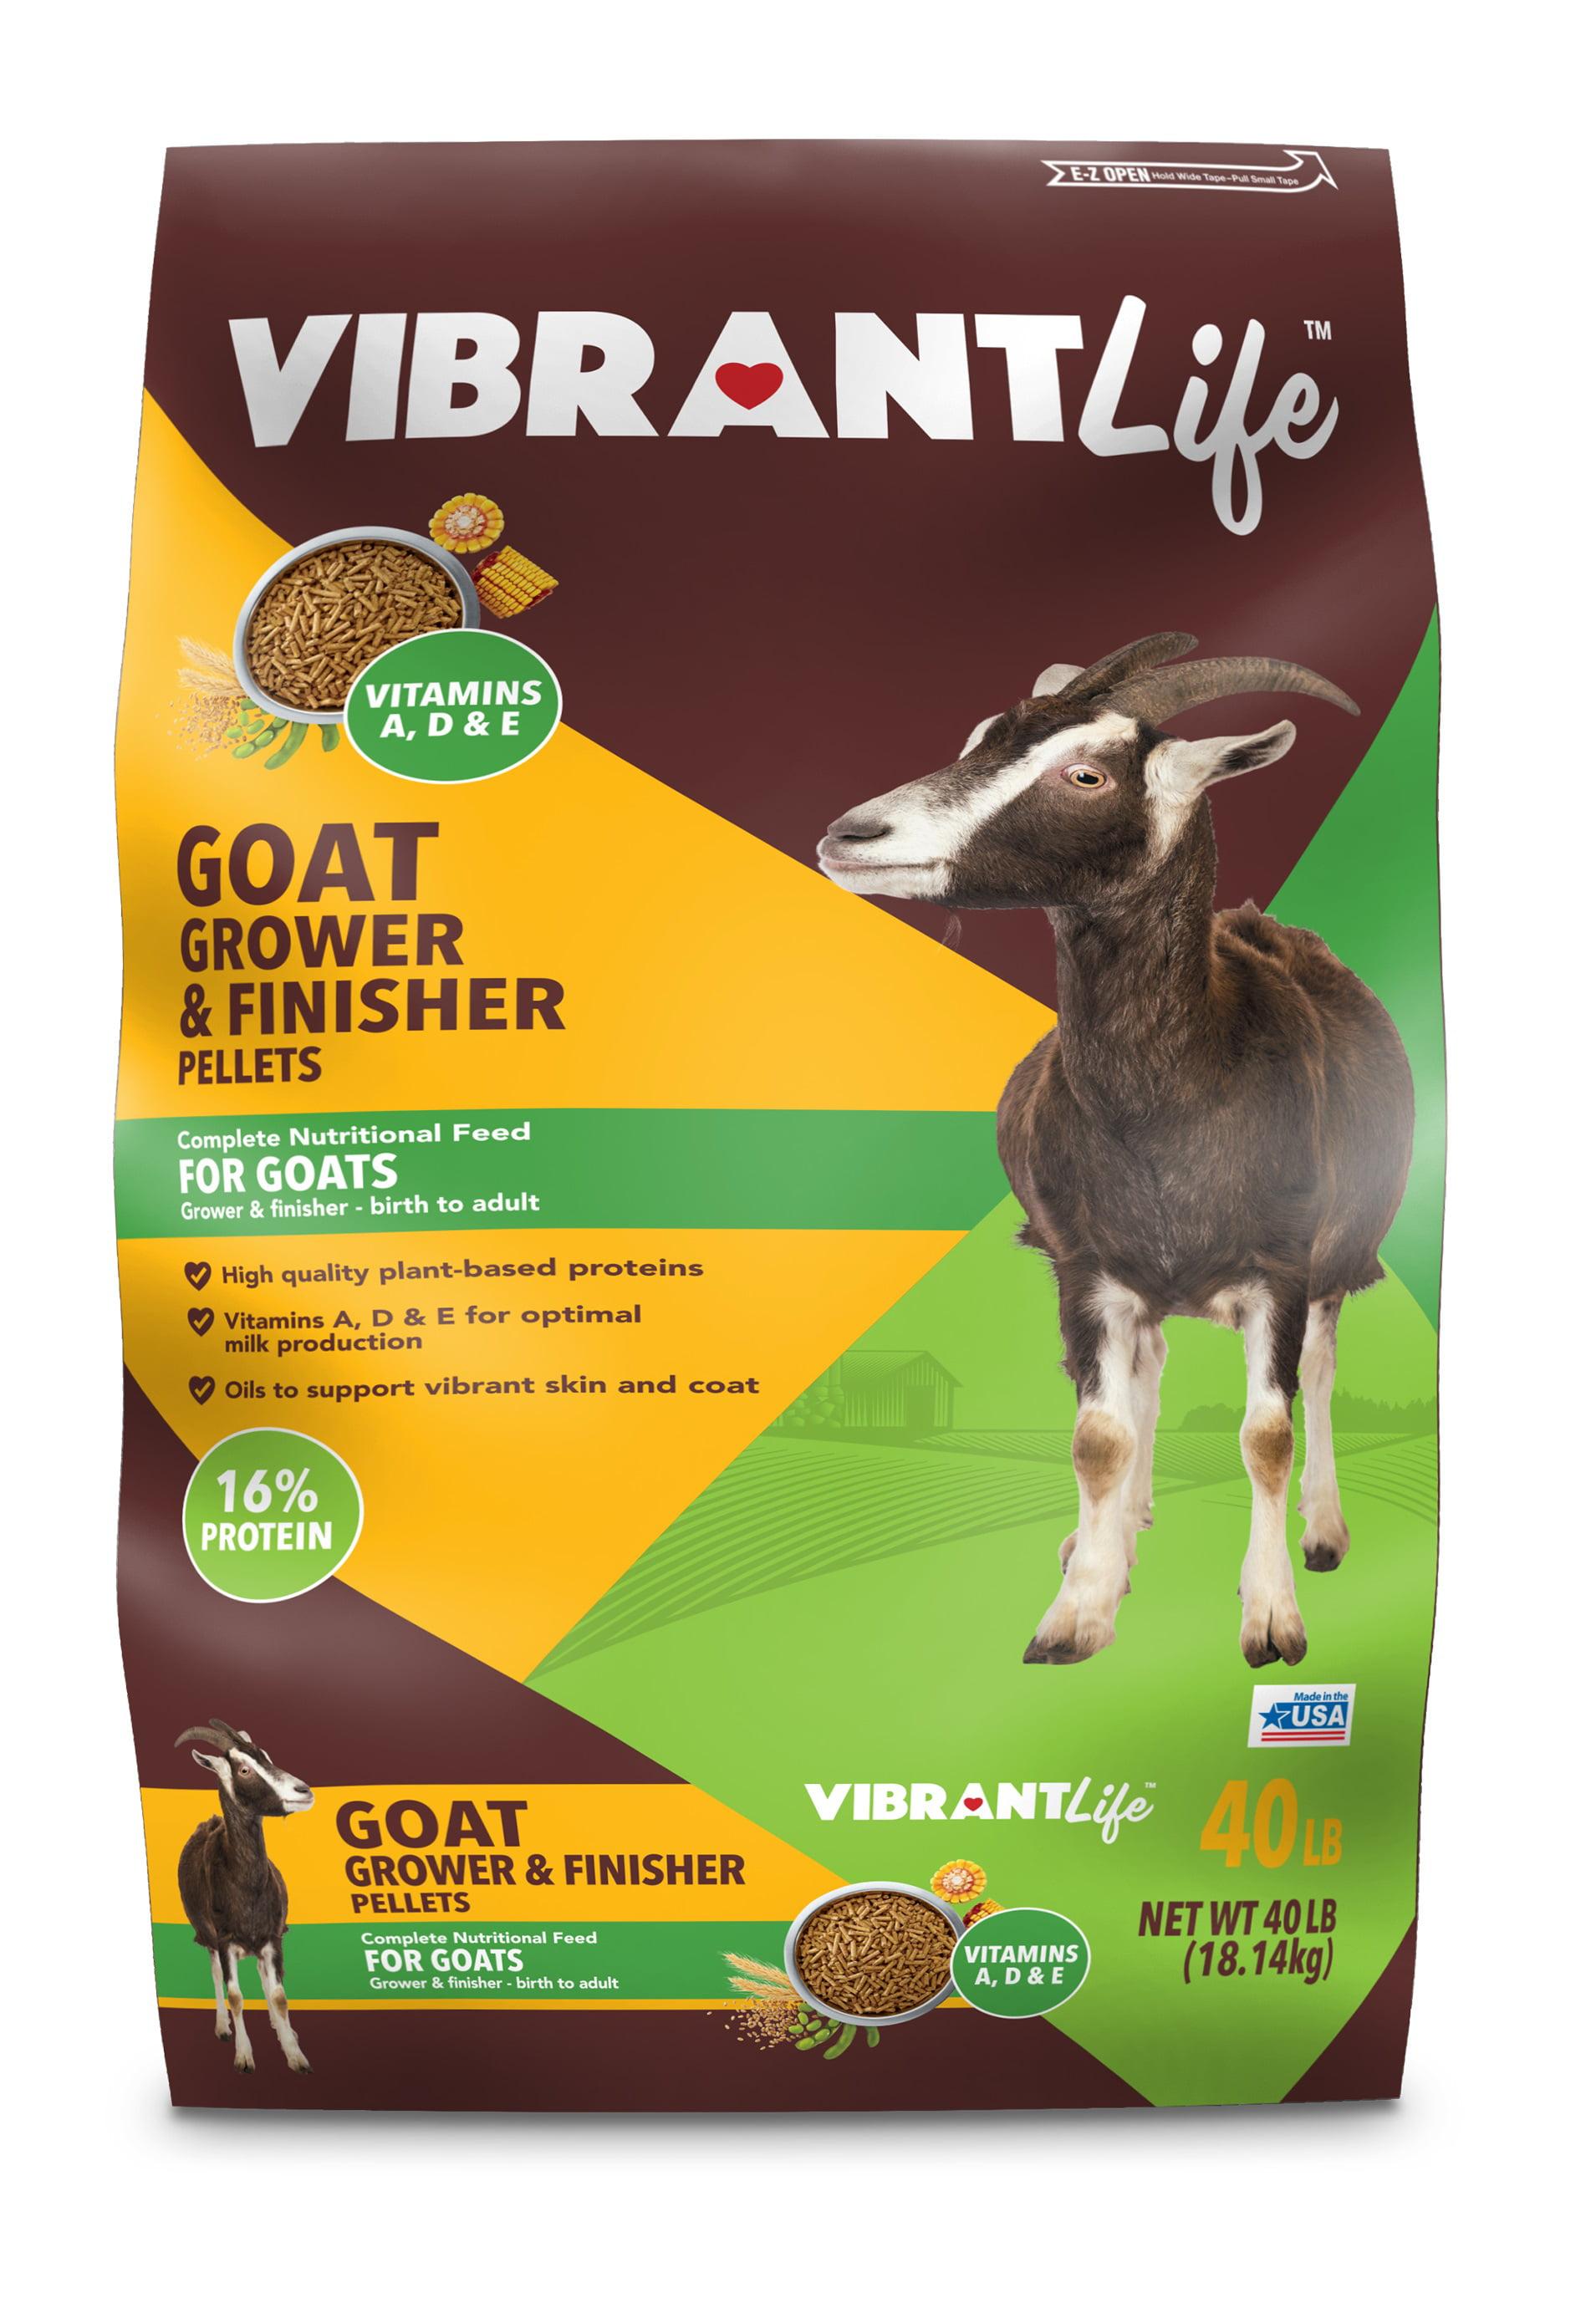 Vibrant Life Goat Grower Finisher Pellets 40 Lbs Walmart